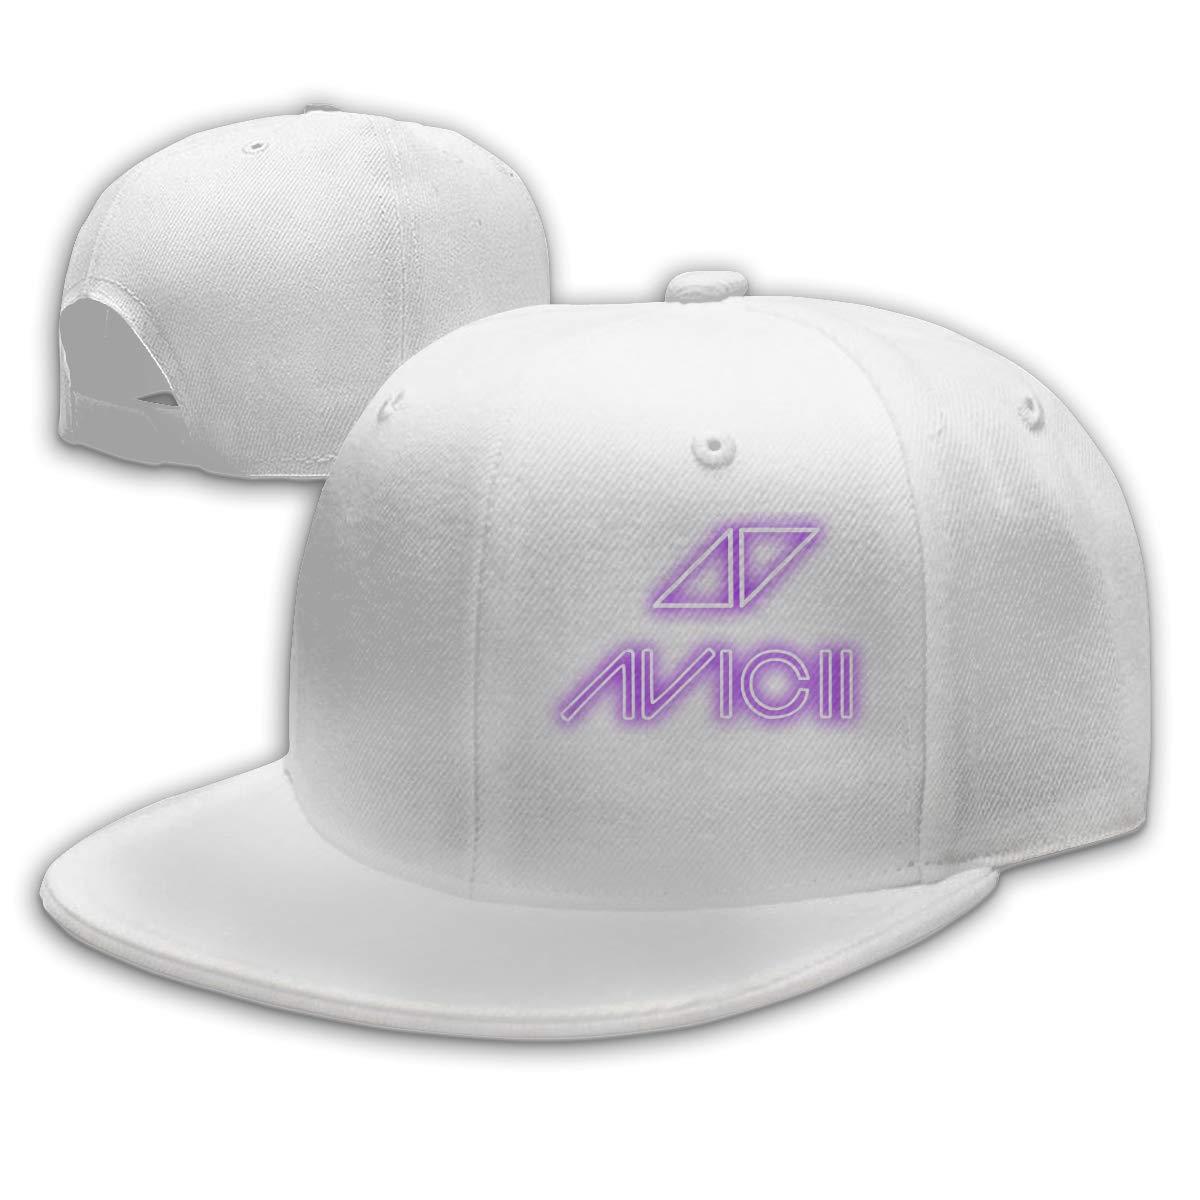 Verstellbar Unisex Damen Herren Cap Classic Avicii Logo Snapback Mode Baseball Cap Flatbrim M/ütze f/ür Jungen M/ädchen Basecap Baseballcap Black